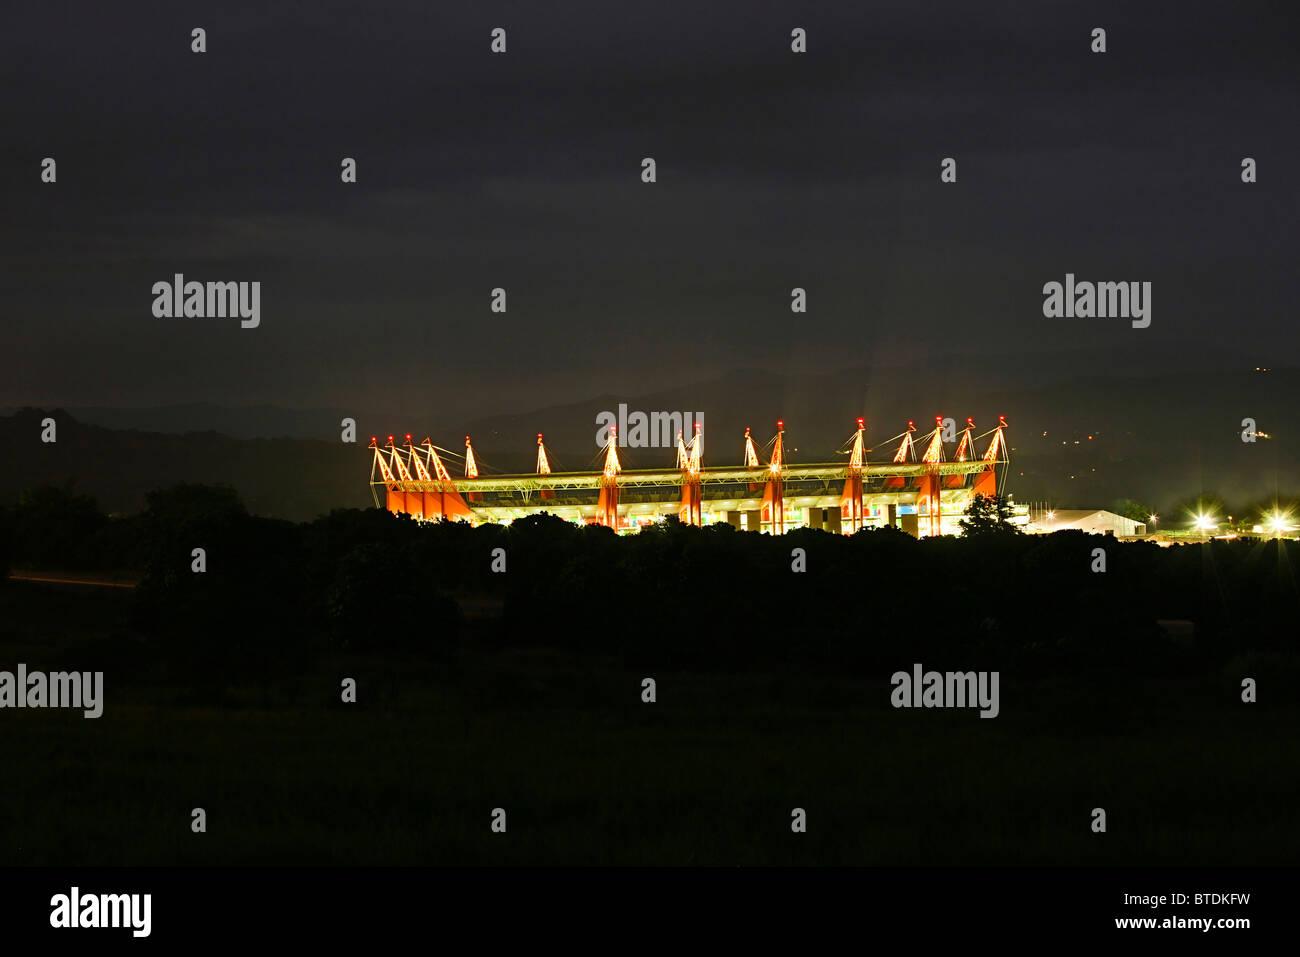 The 2010 FIFA World Cup Mbombela stadium viewed at dusk - Stock Image